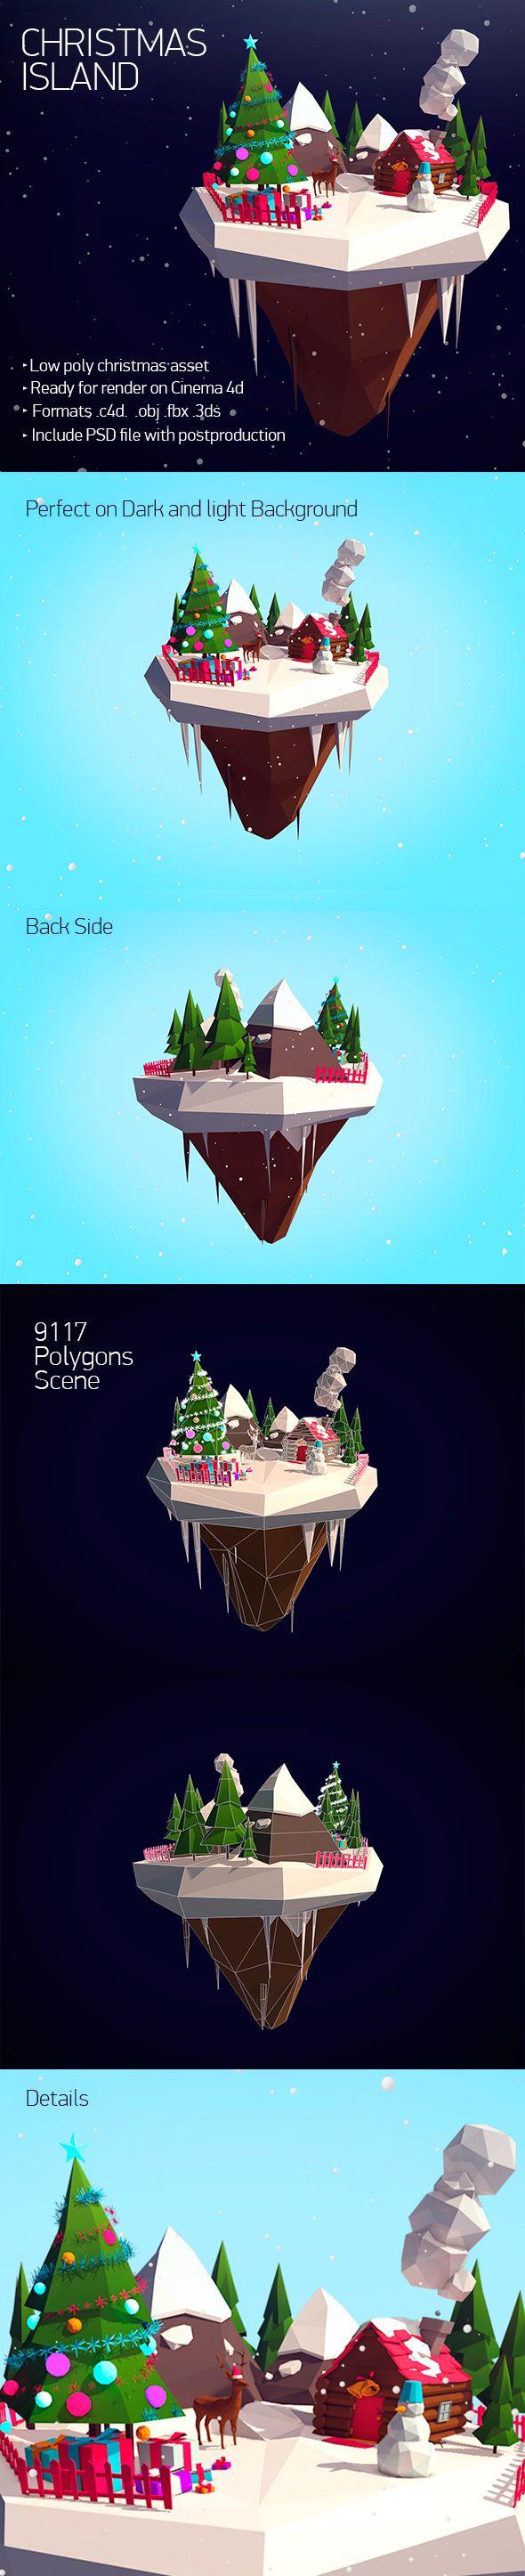 Low Poly Christmas Island 3D Models Design Template #c4d #cinema4d #3D #3dDesign Download here: https://3docean.net/item/christmas-island/13911074?ref=yinkira